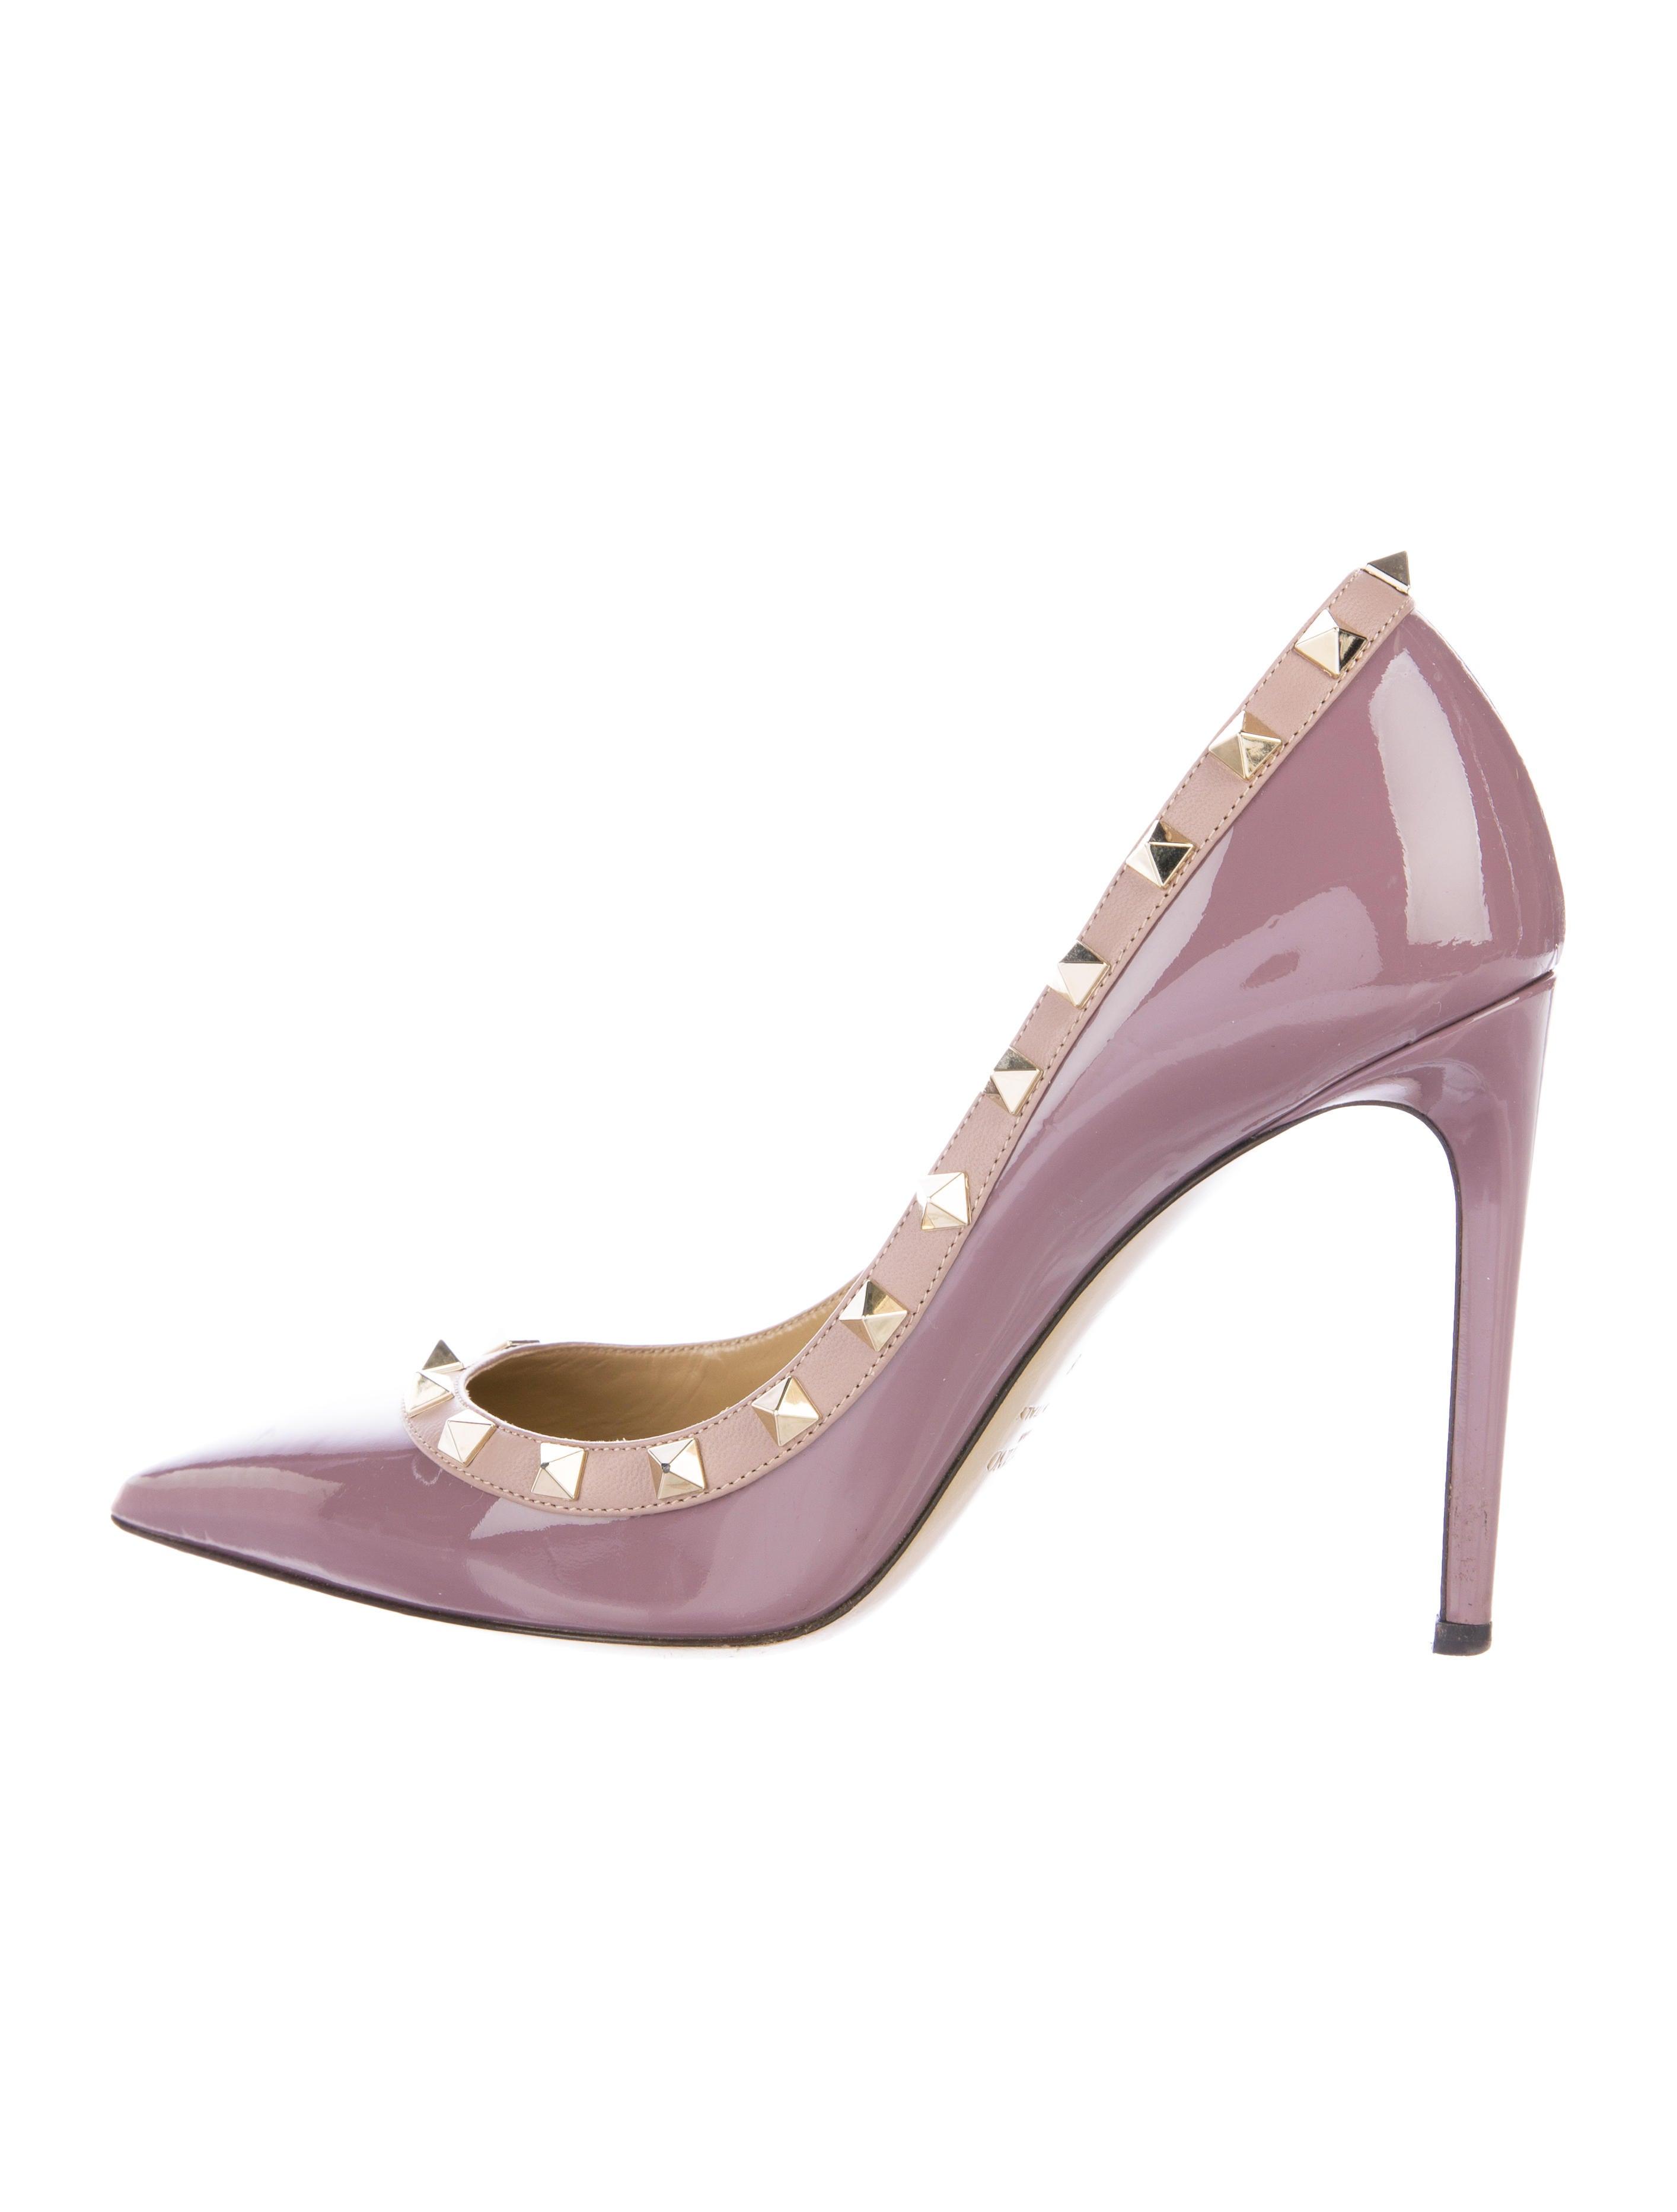 valentino patent leather pump rockstud shoes val72136. Black Bedroom Furniture Sets. Home Design Ideas